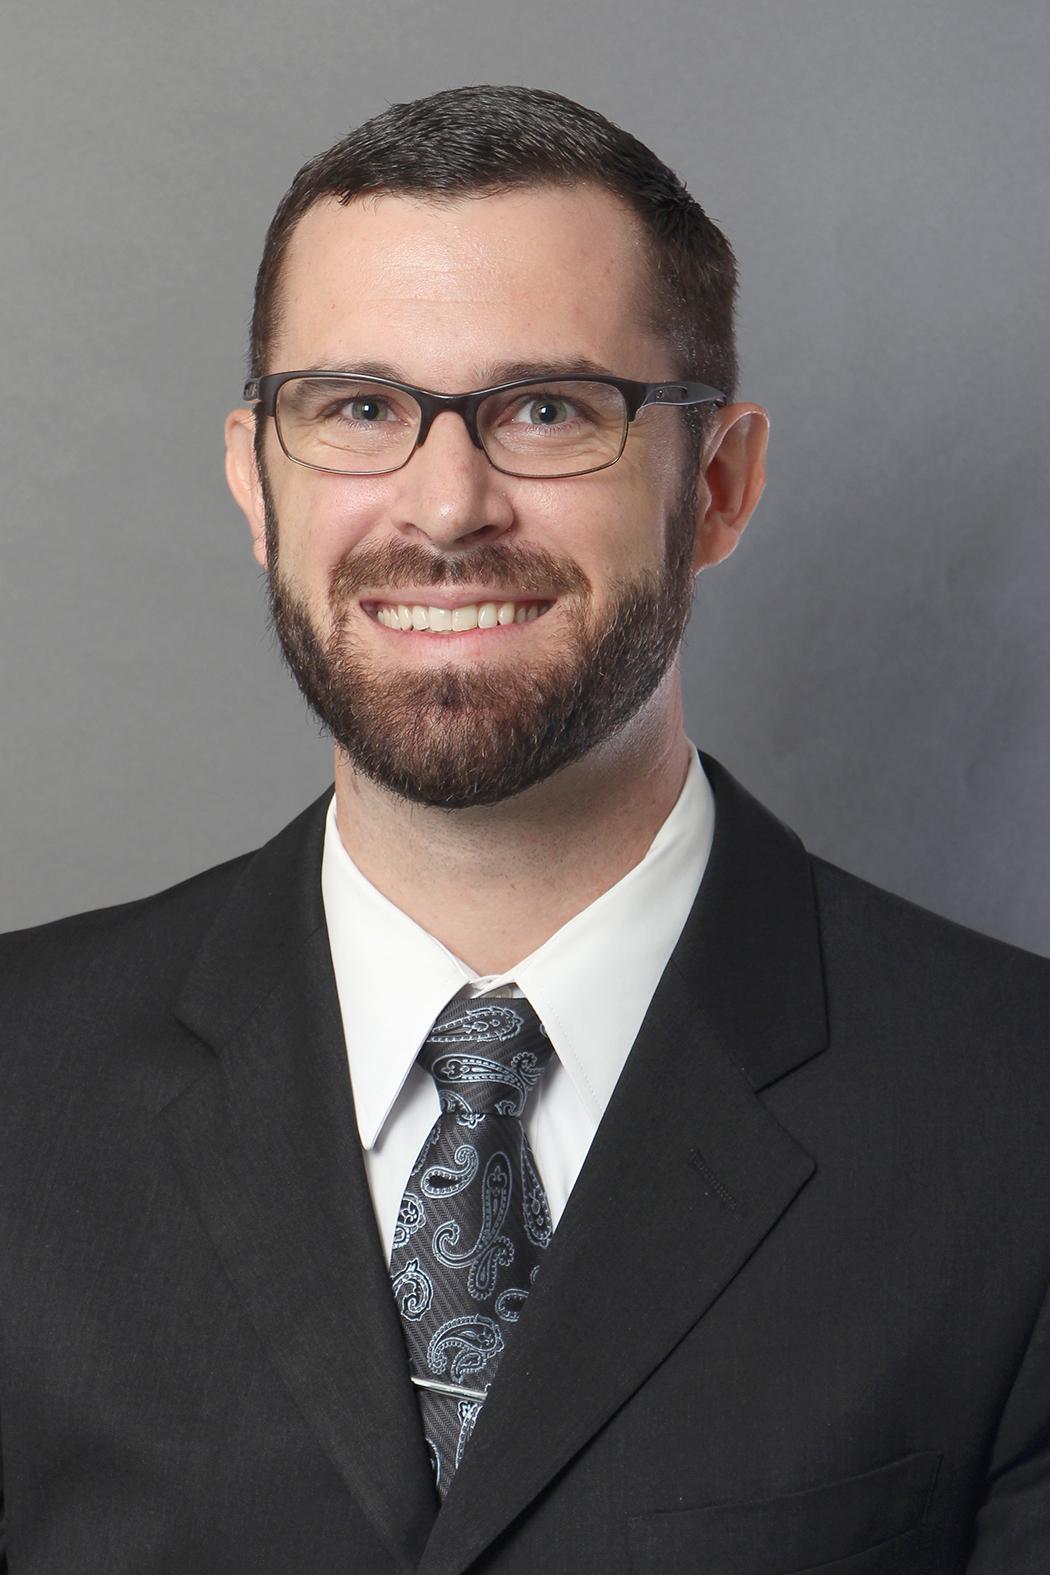 NICHOLAS JOSEPH MCCARTHY Financial Professional & Insurance Agent